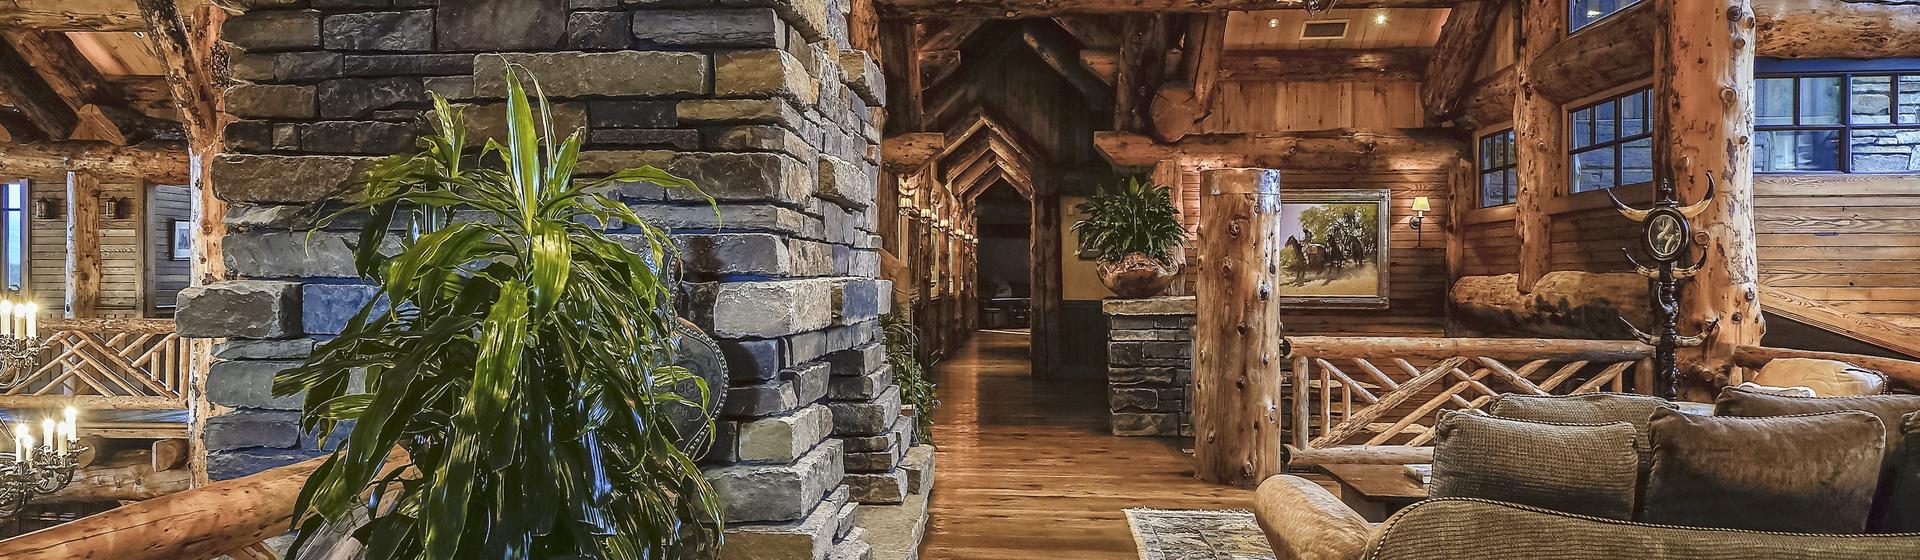 6.3-Telluride-Sleeping-Indian-Ranch-second-floor-landing-sitting-area-2-web.JPG